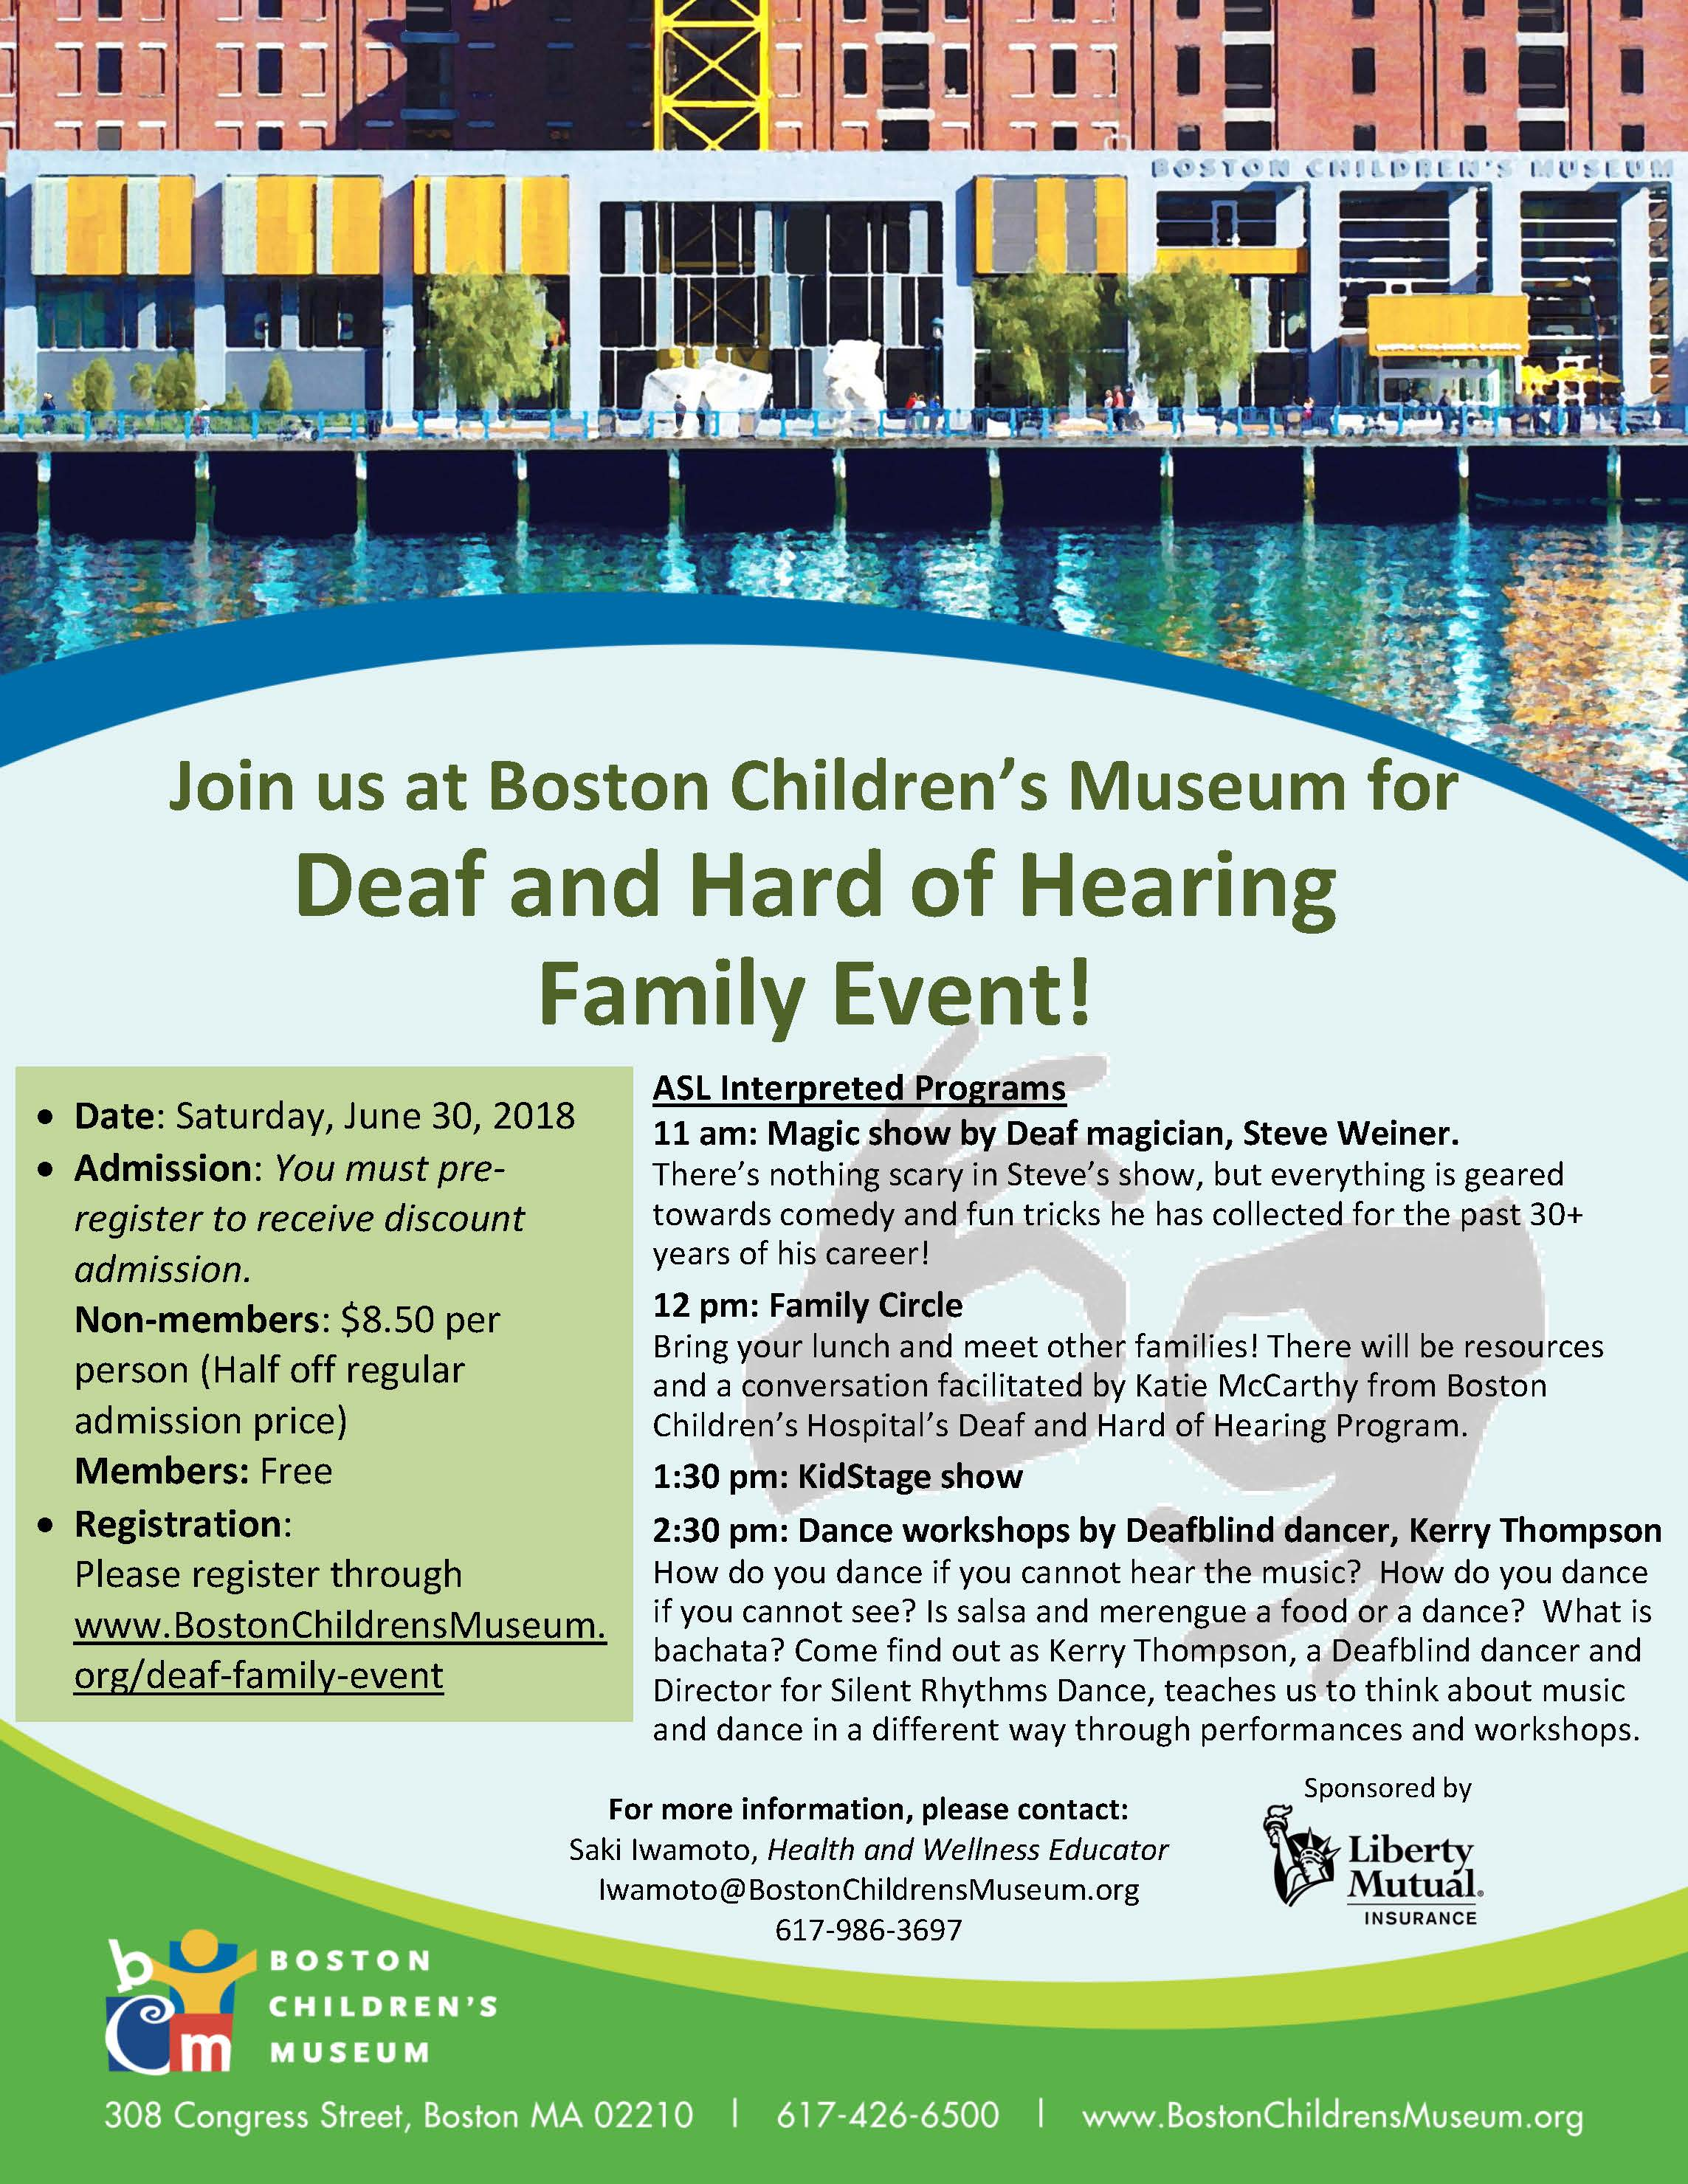 Family Event at Boston Children's Museum